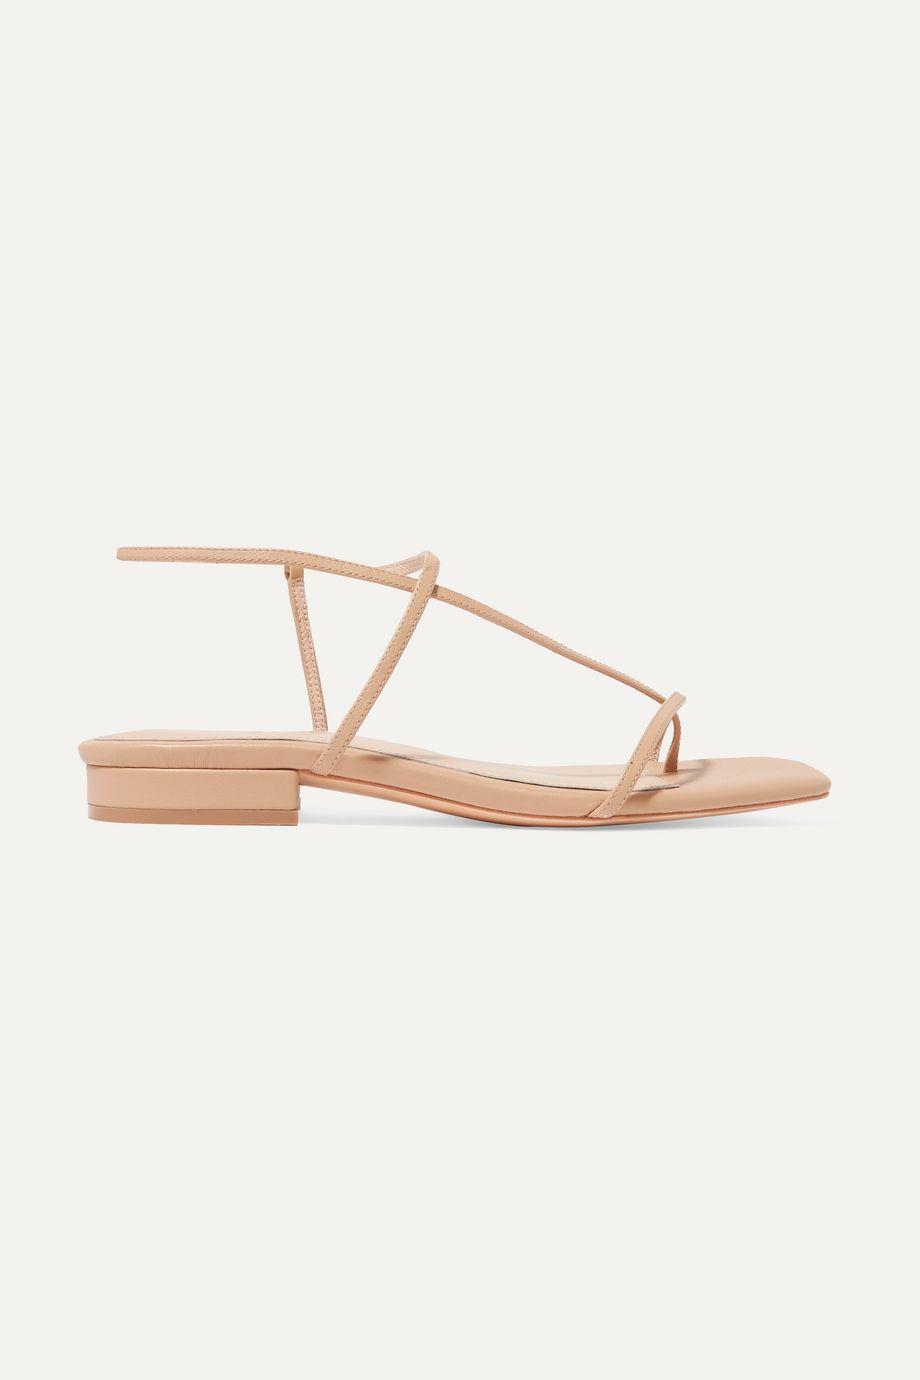 STUDIO AMELIA 1.2 leather sandals